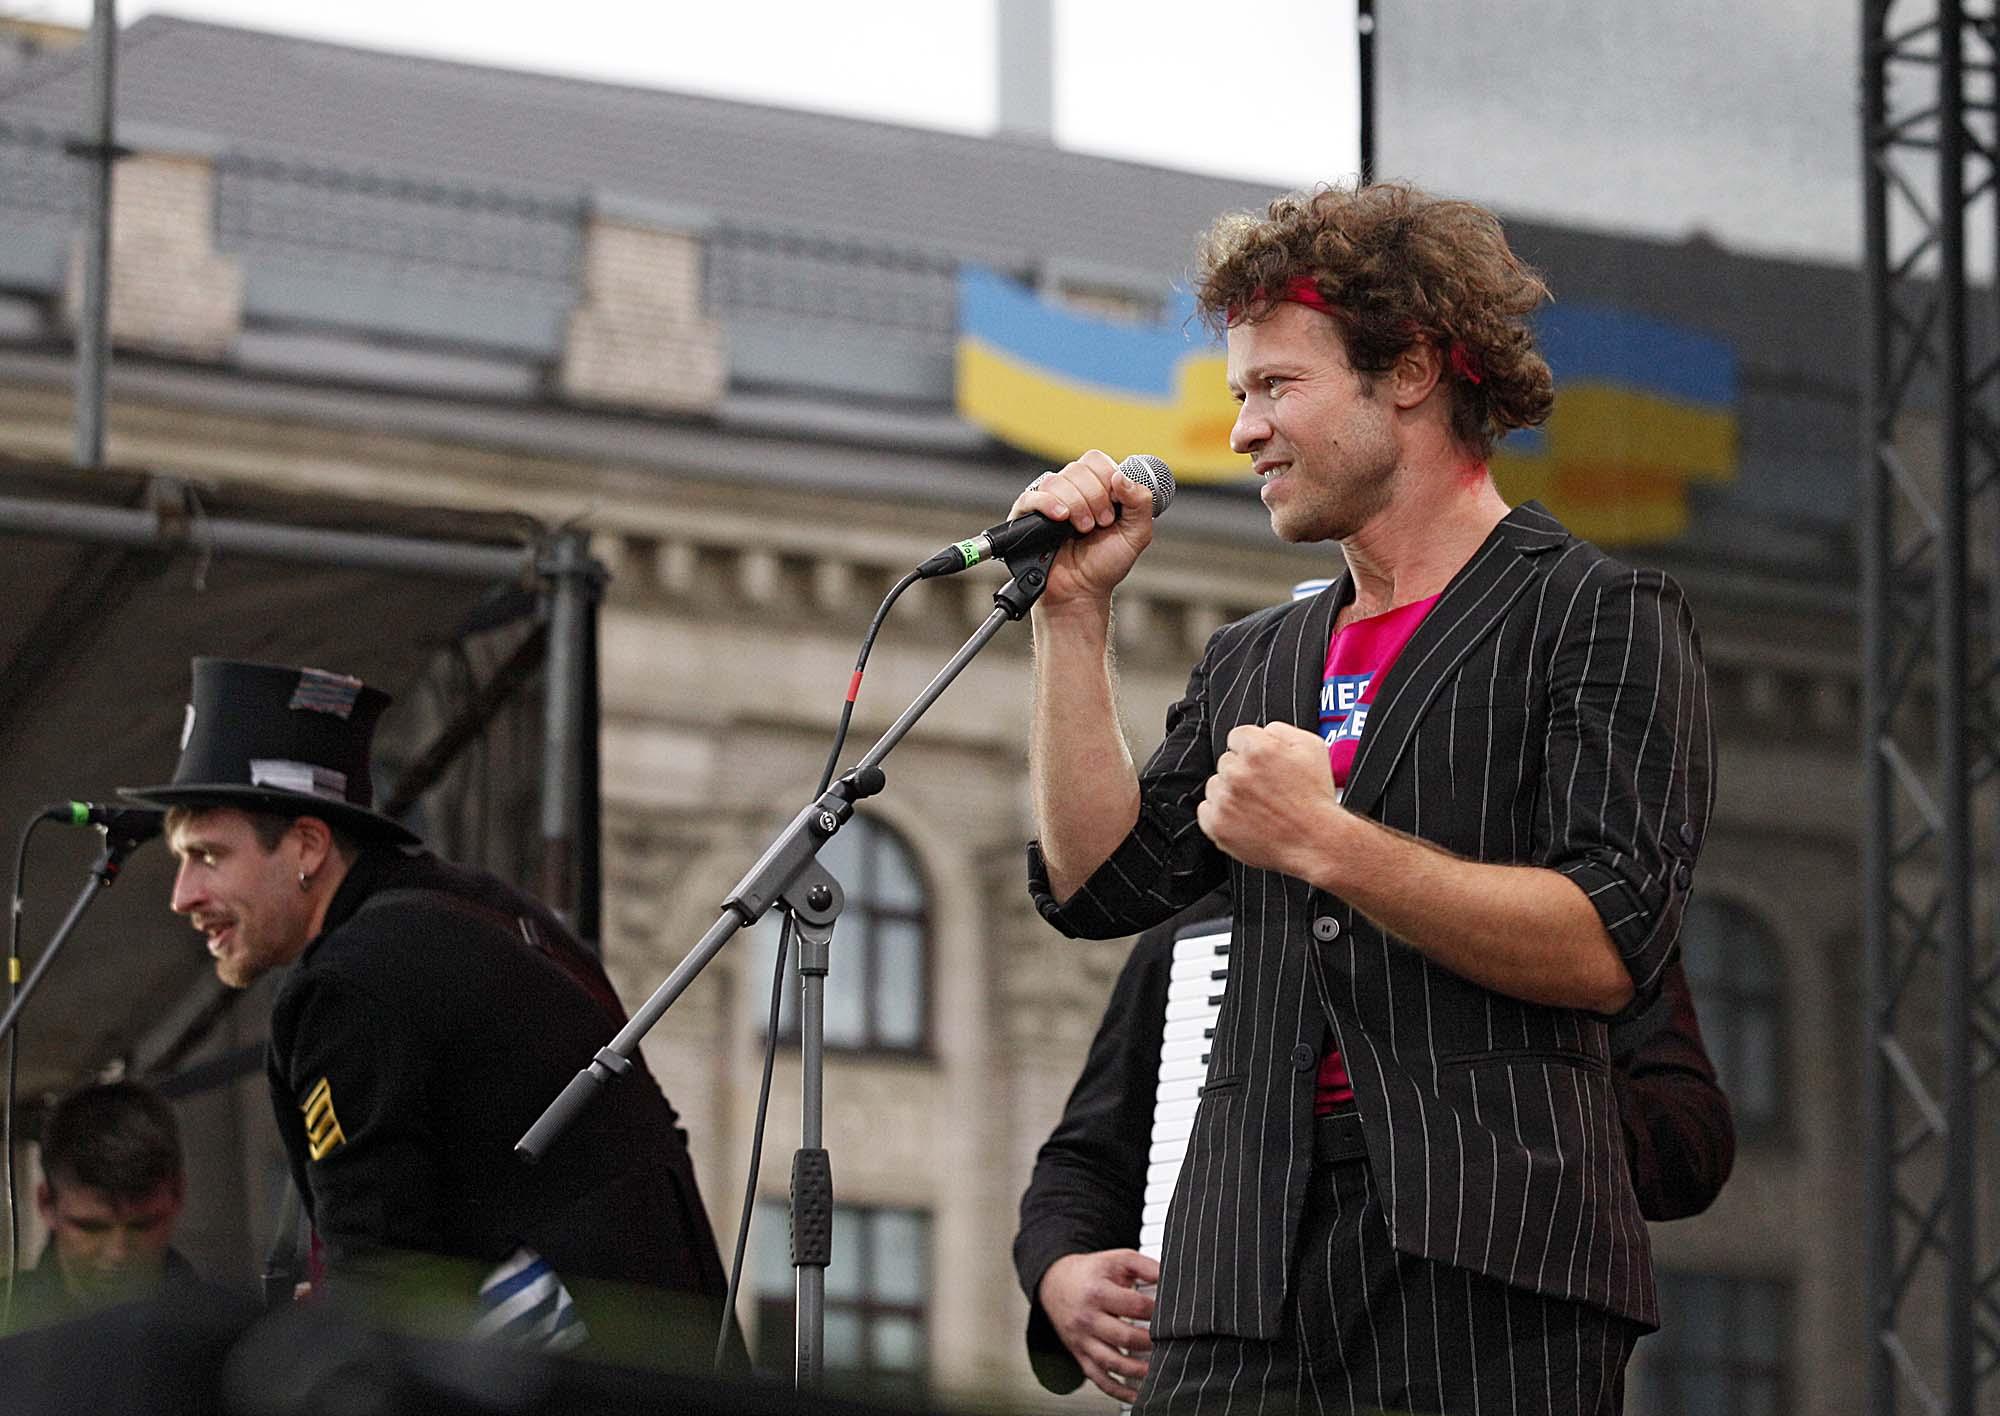 Фелікс Шиндер, керивник гурту «Деньги вперед», Одеса